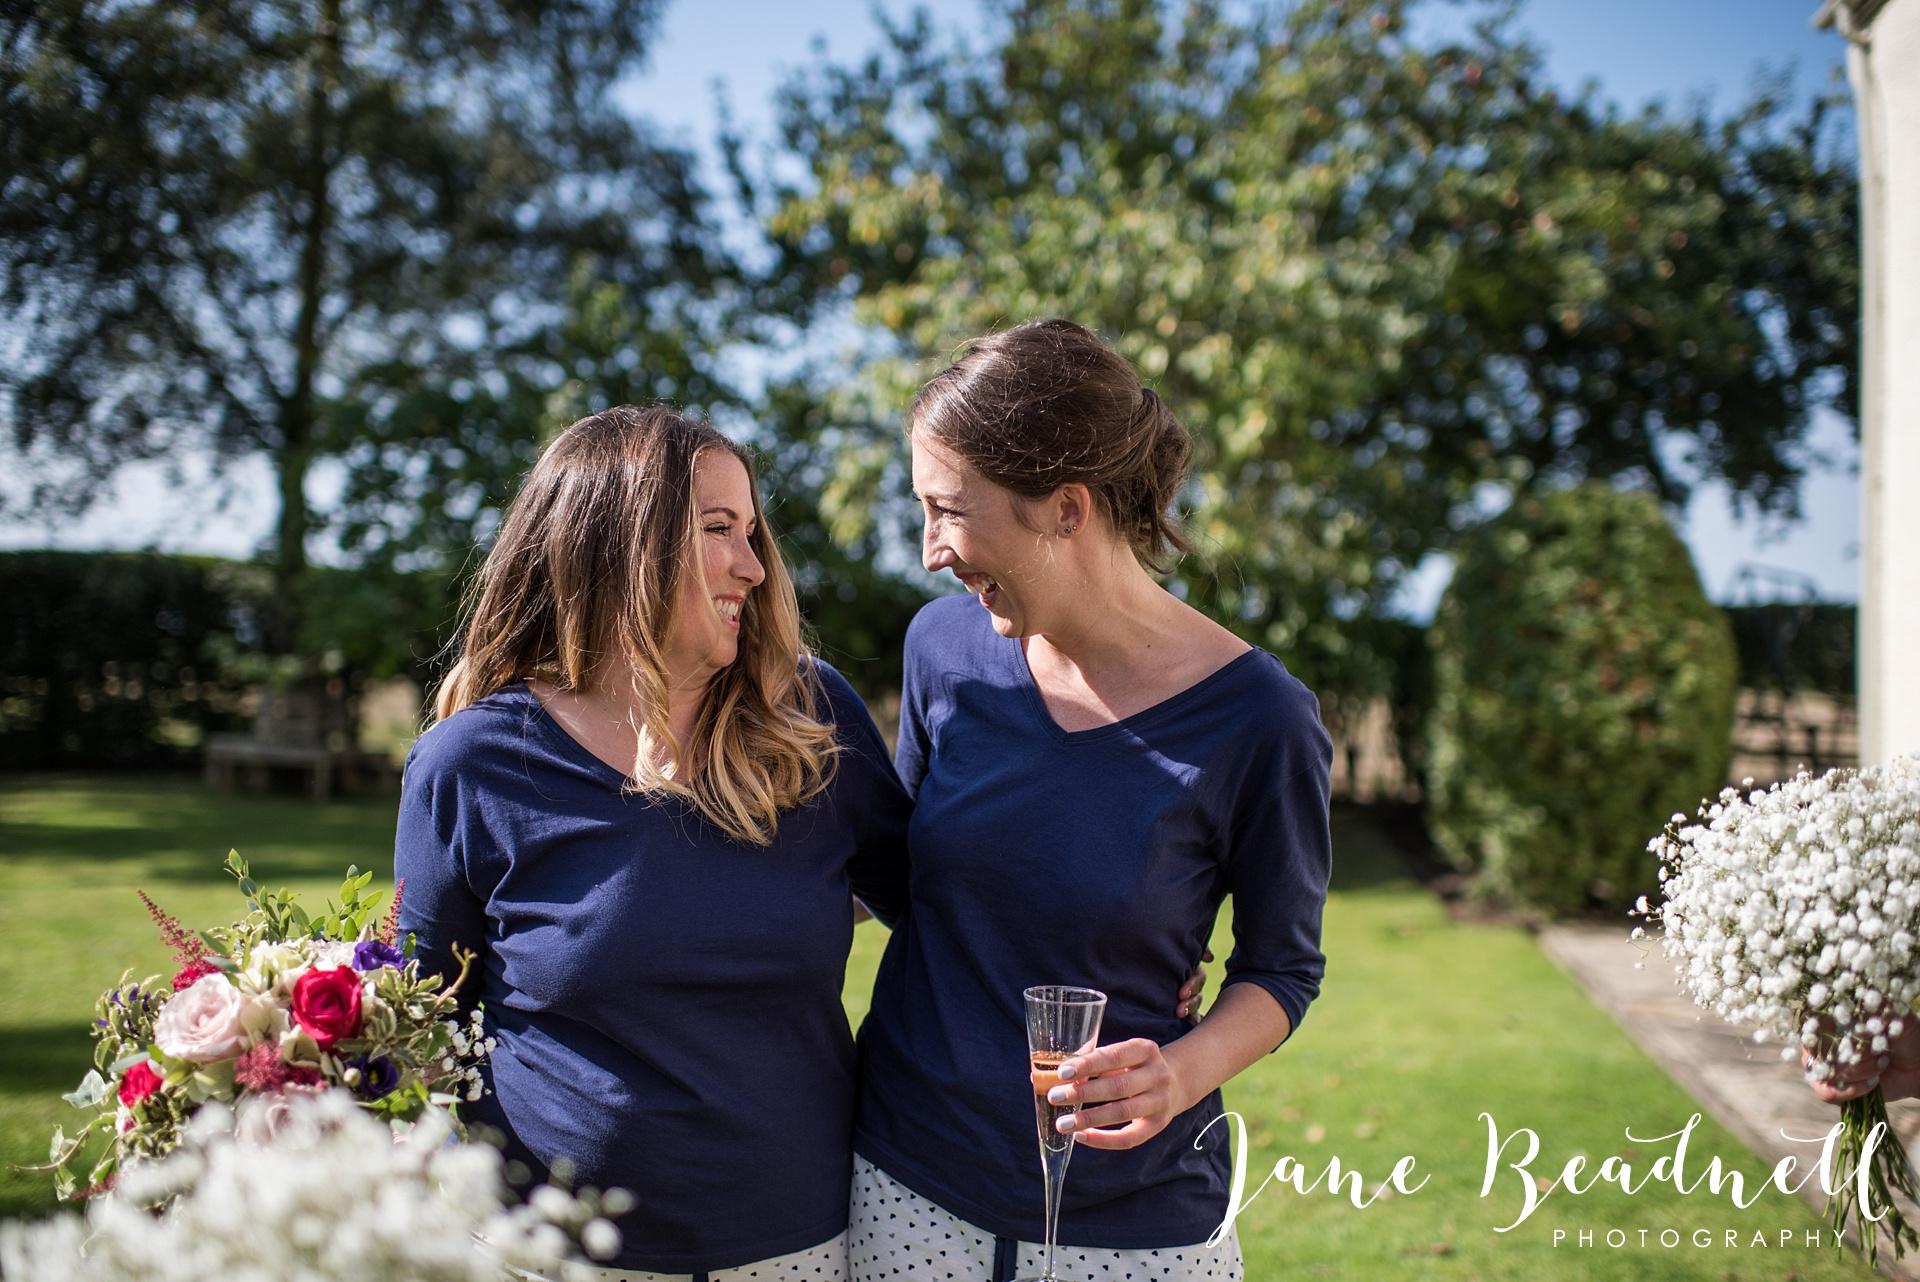 fine-art-wedding-photographer-jane-beadnell-yorkshire-wedding-photographer_0012